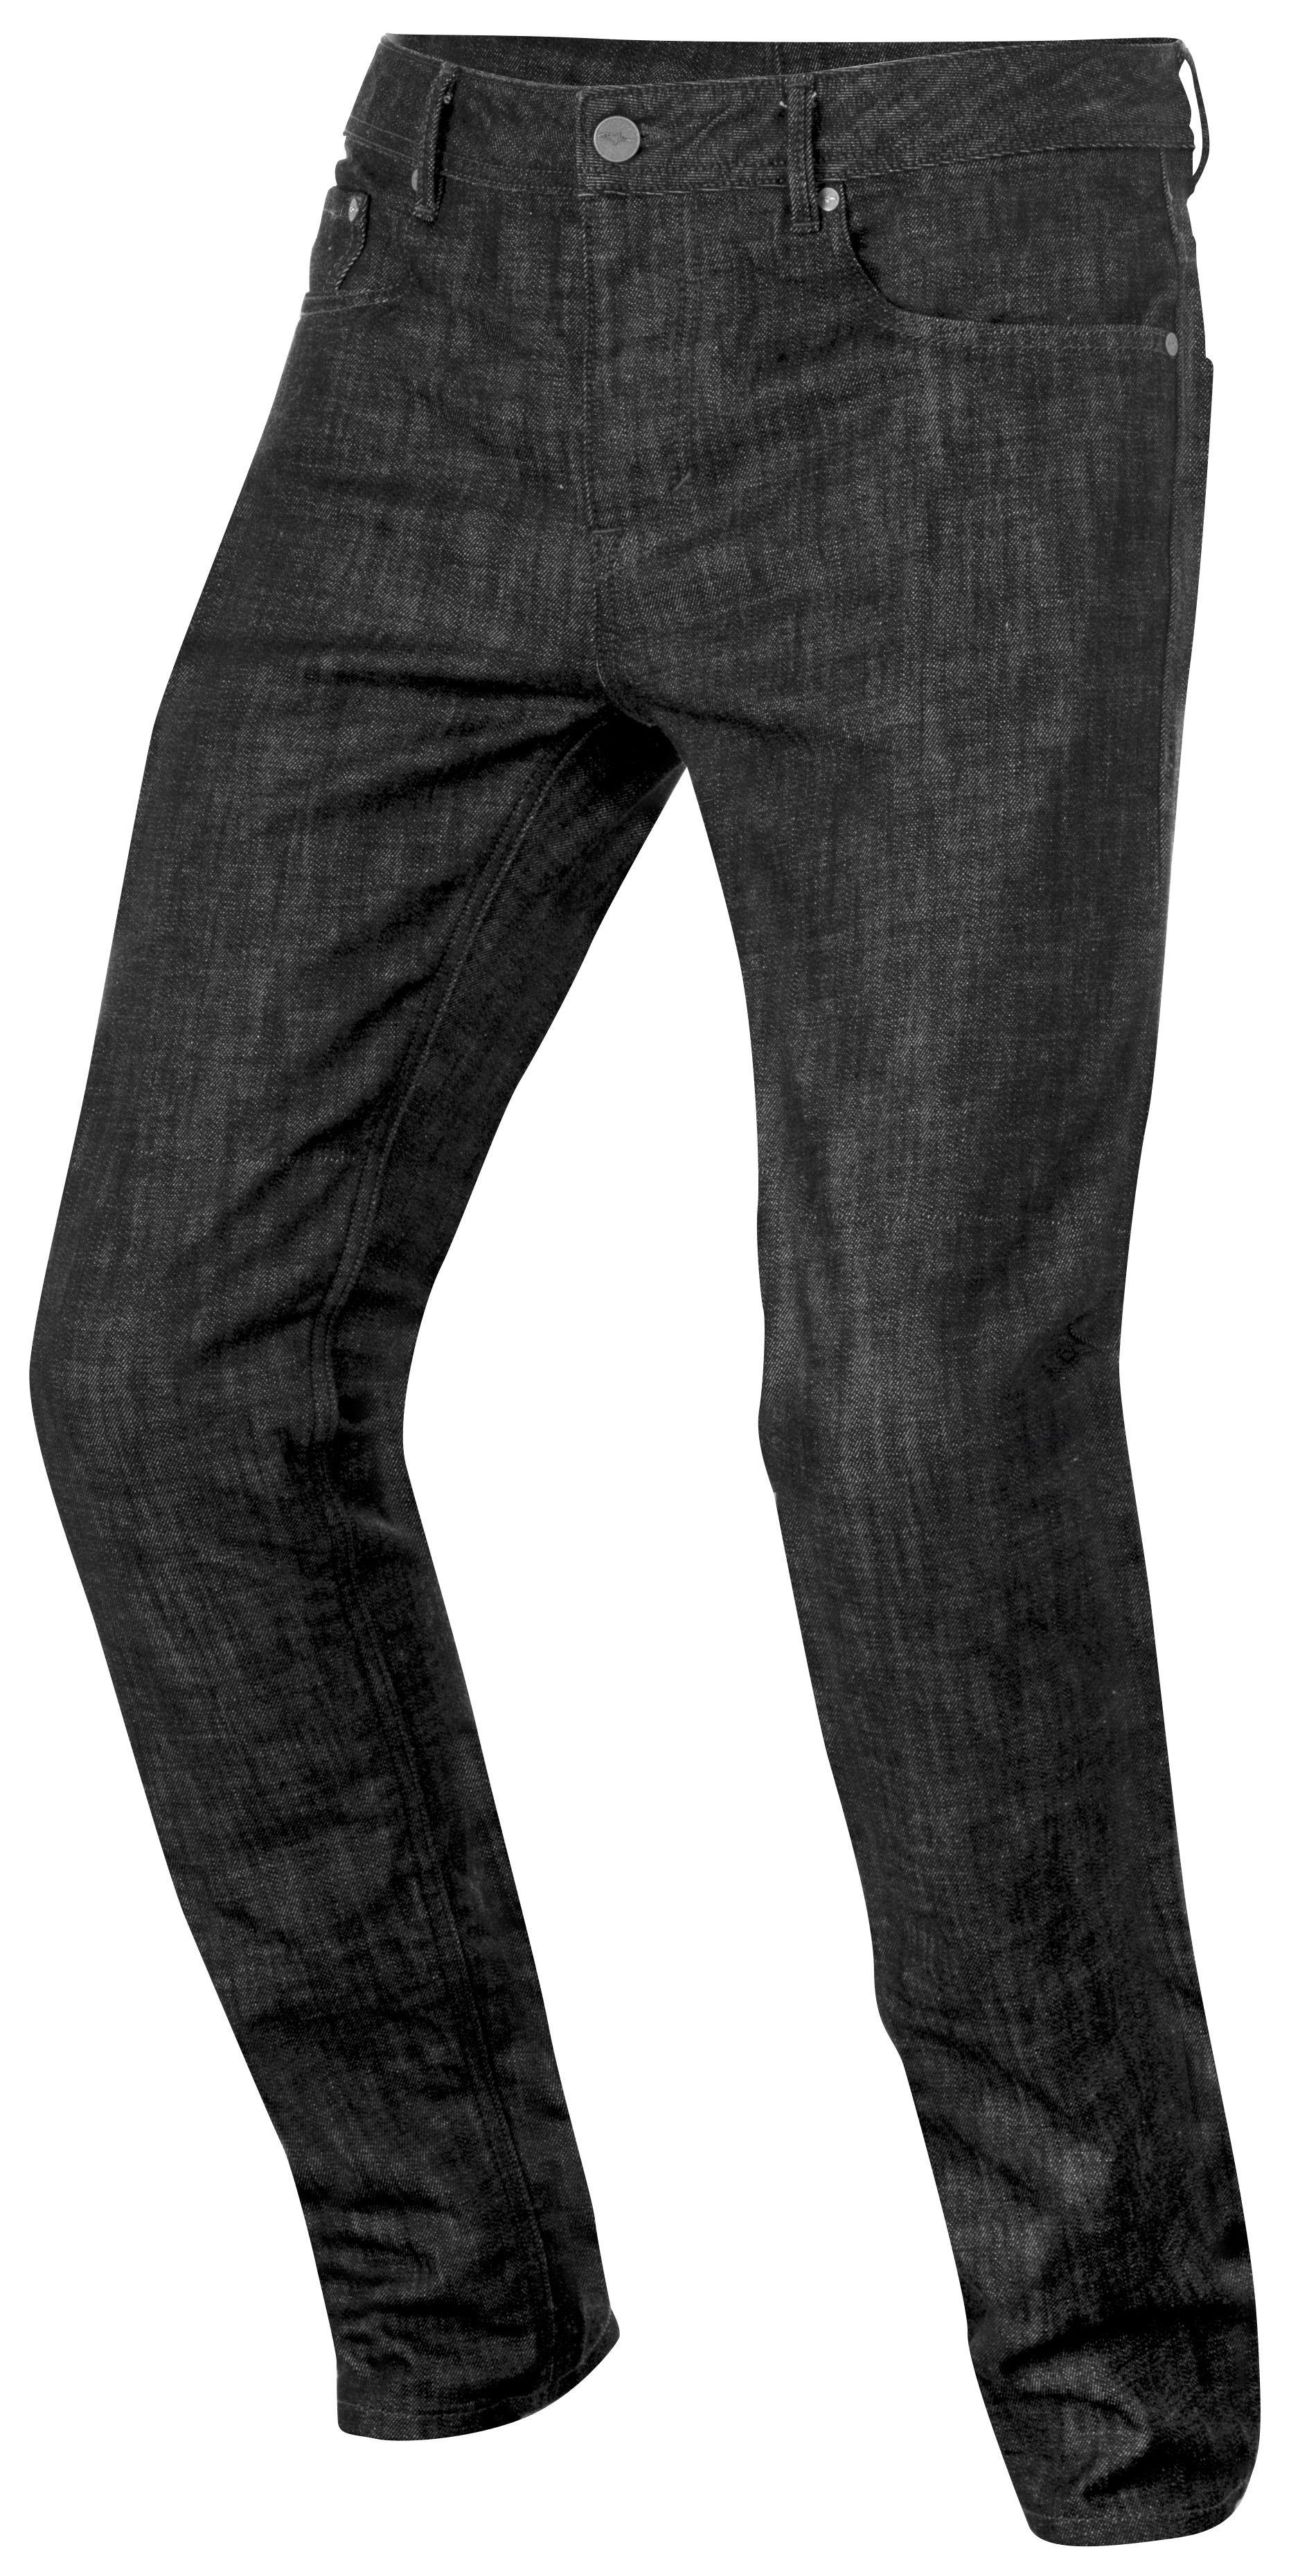 Alpinestars Copper Motorcycle Jeans Denim Pants Dark Rinse